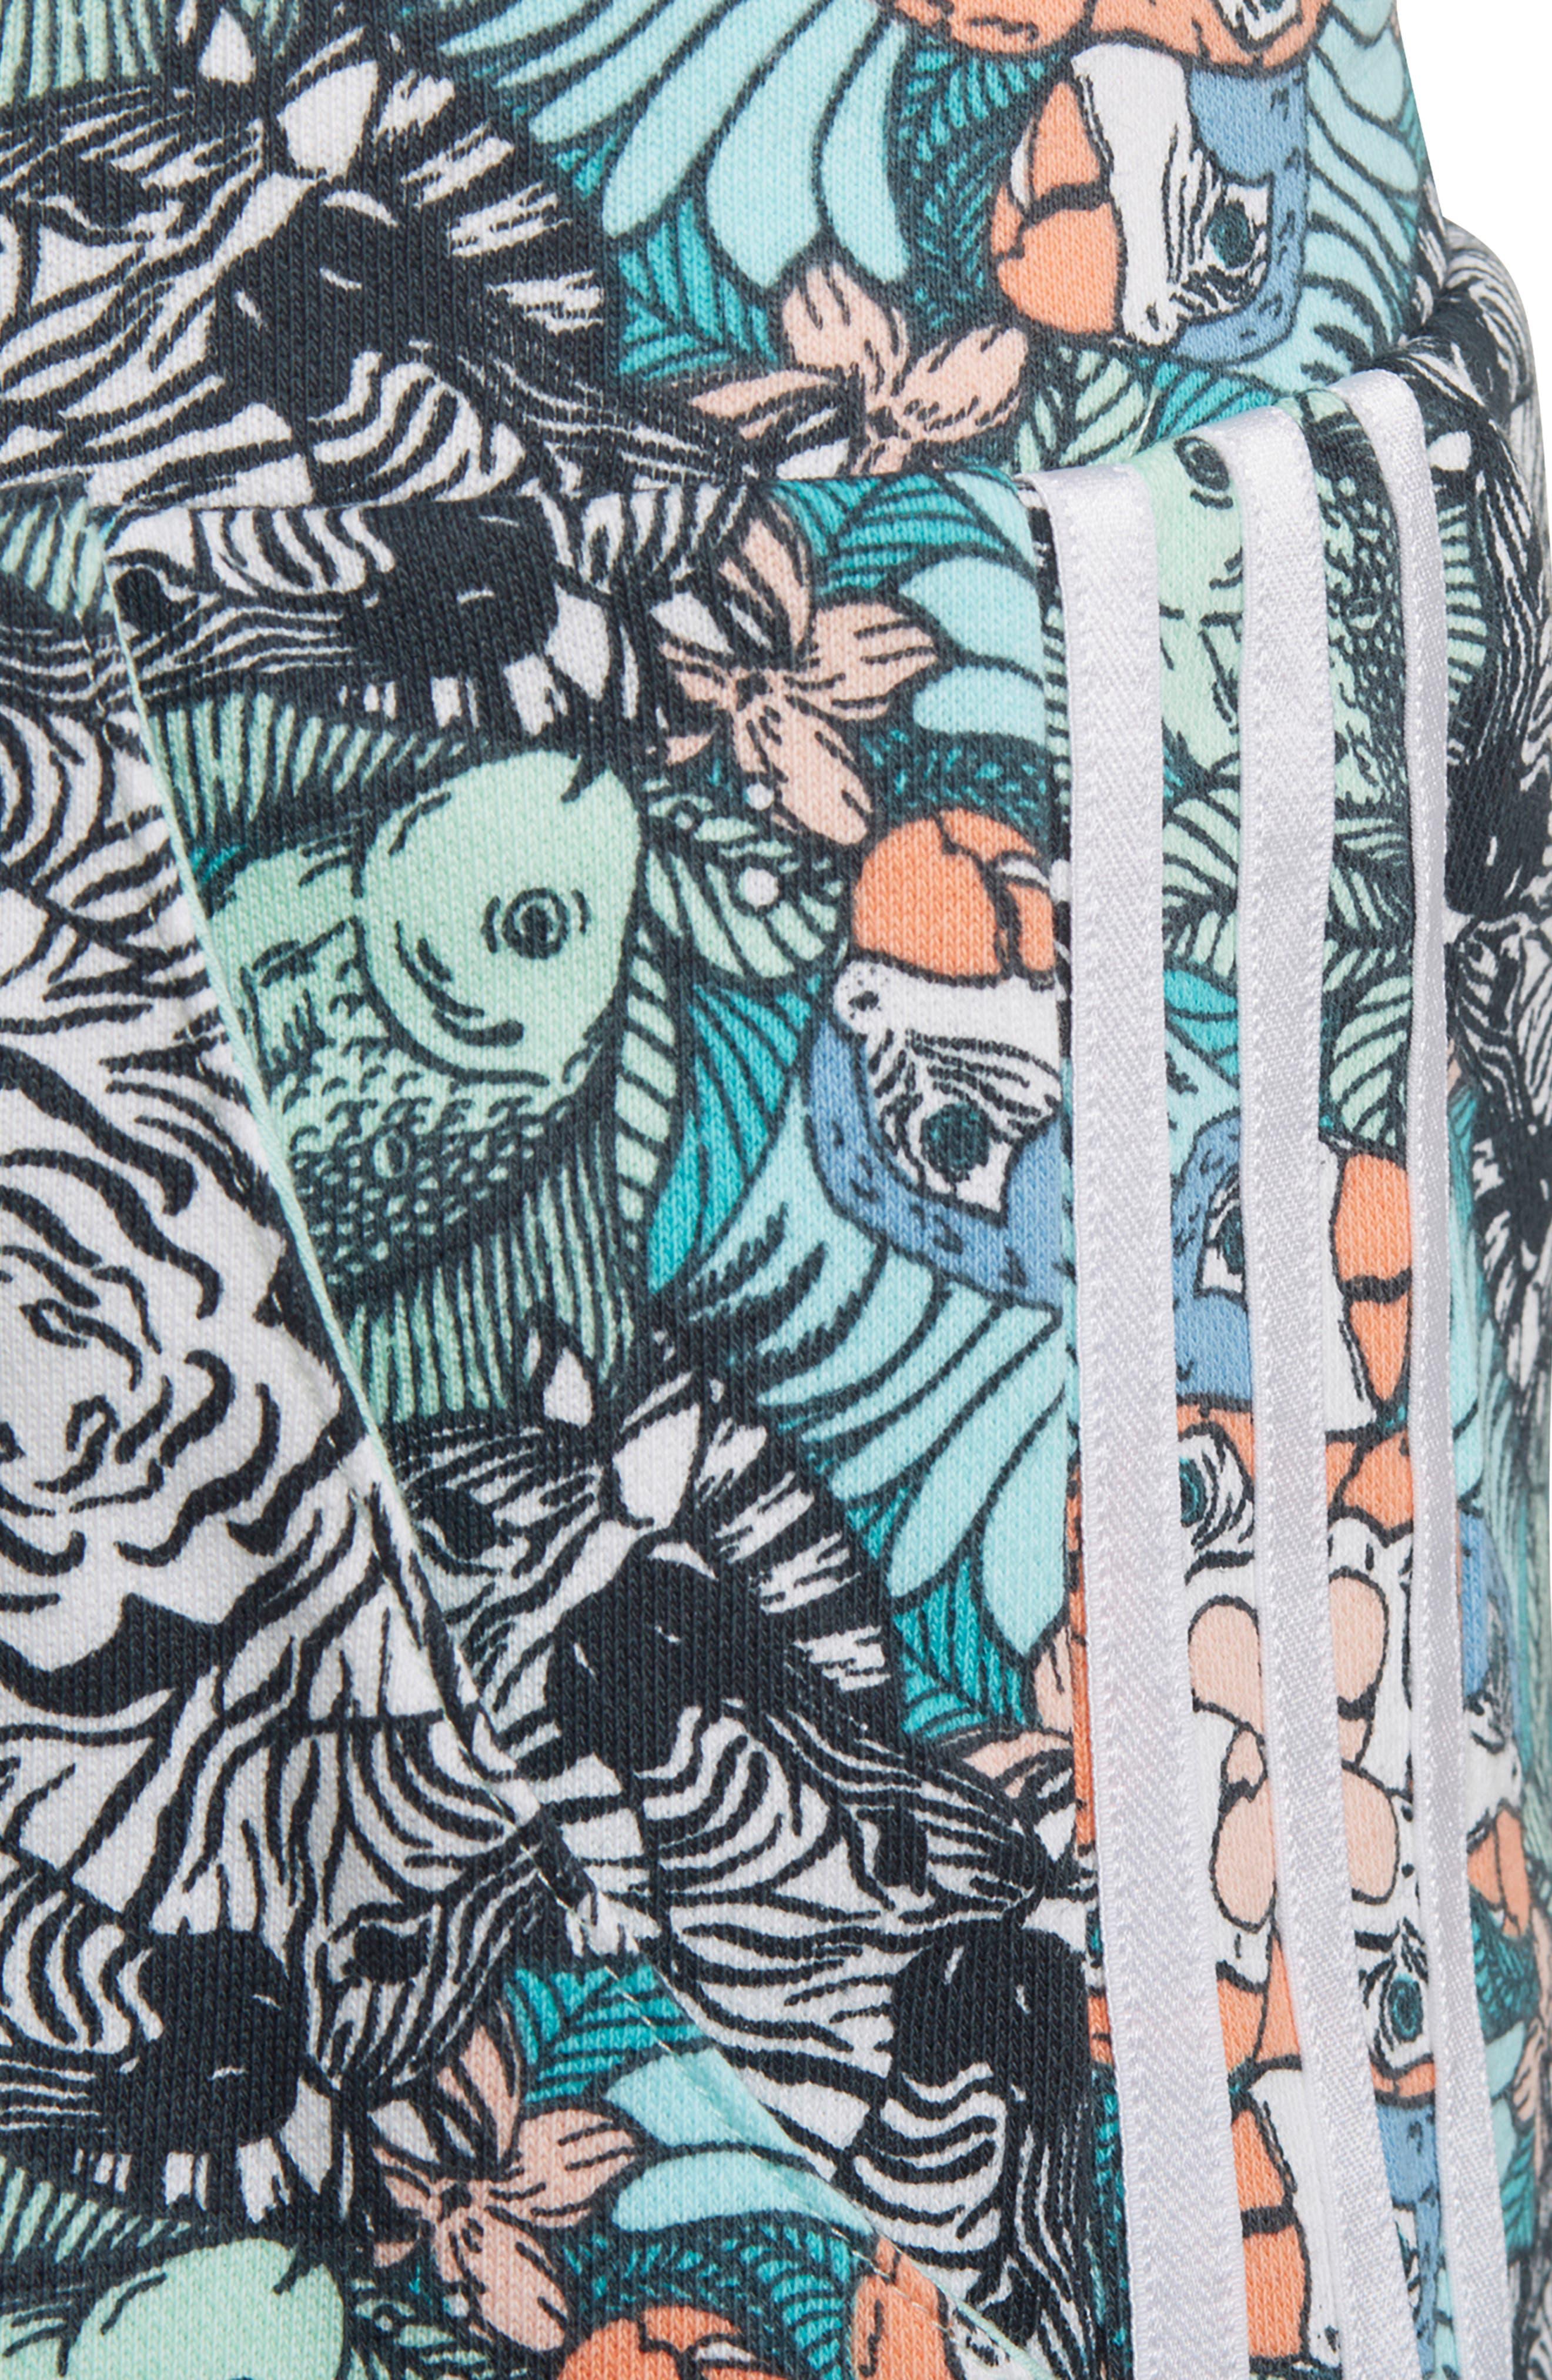 Zoo Shorts,                             Alternate thumbnail 6, color,                             MULTI-COLOR / WHITE